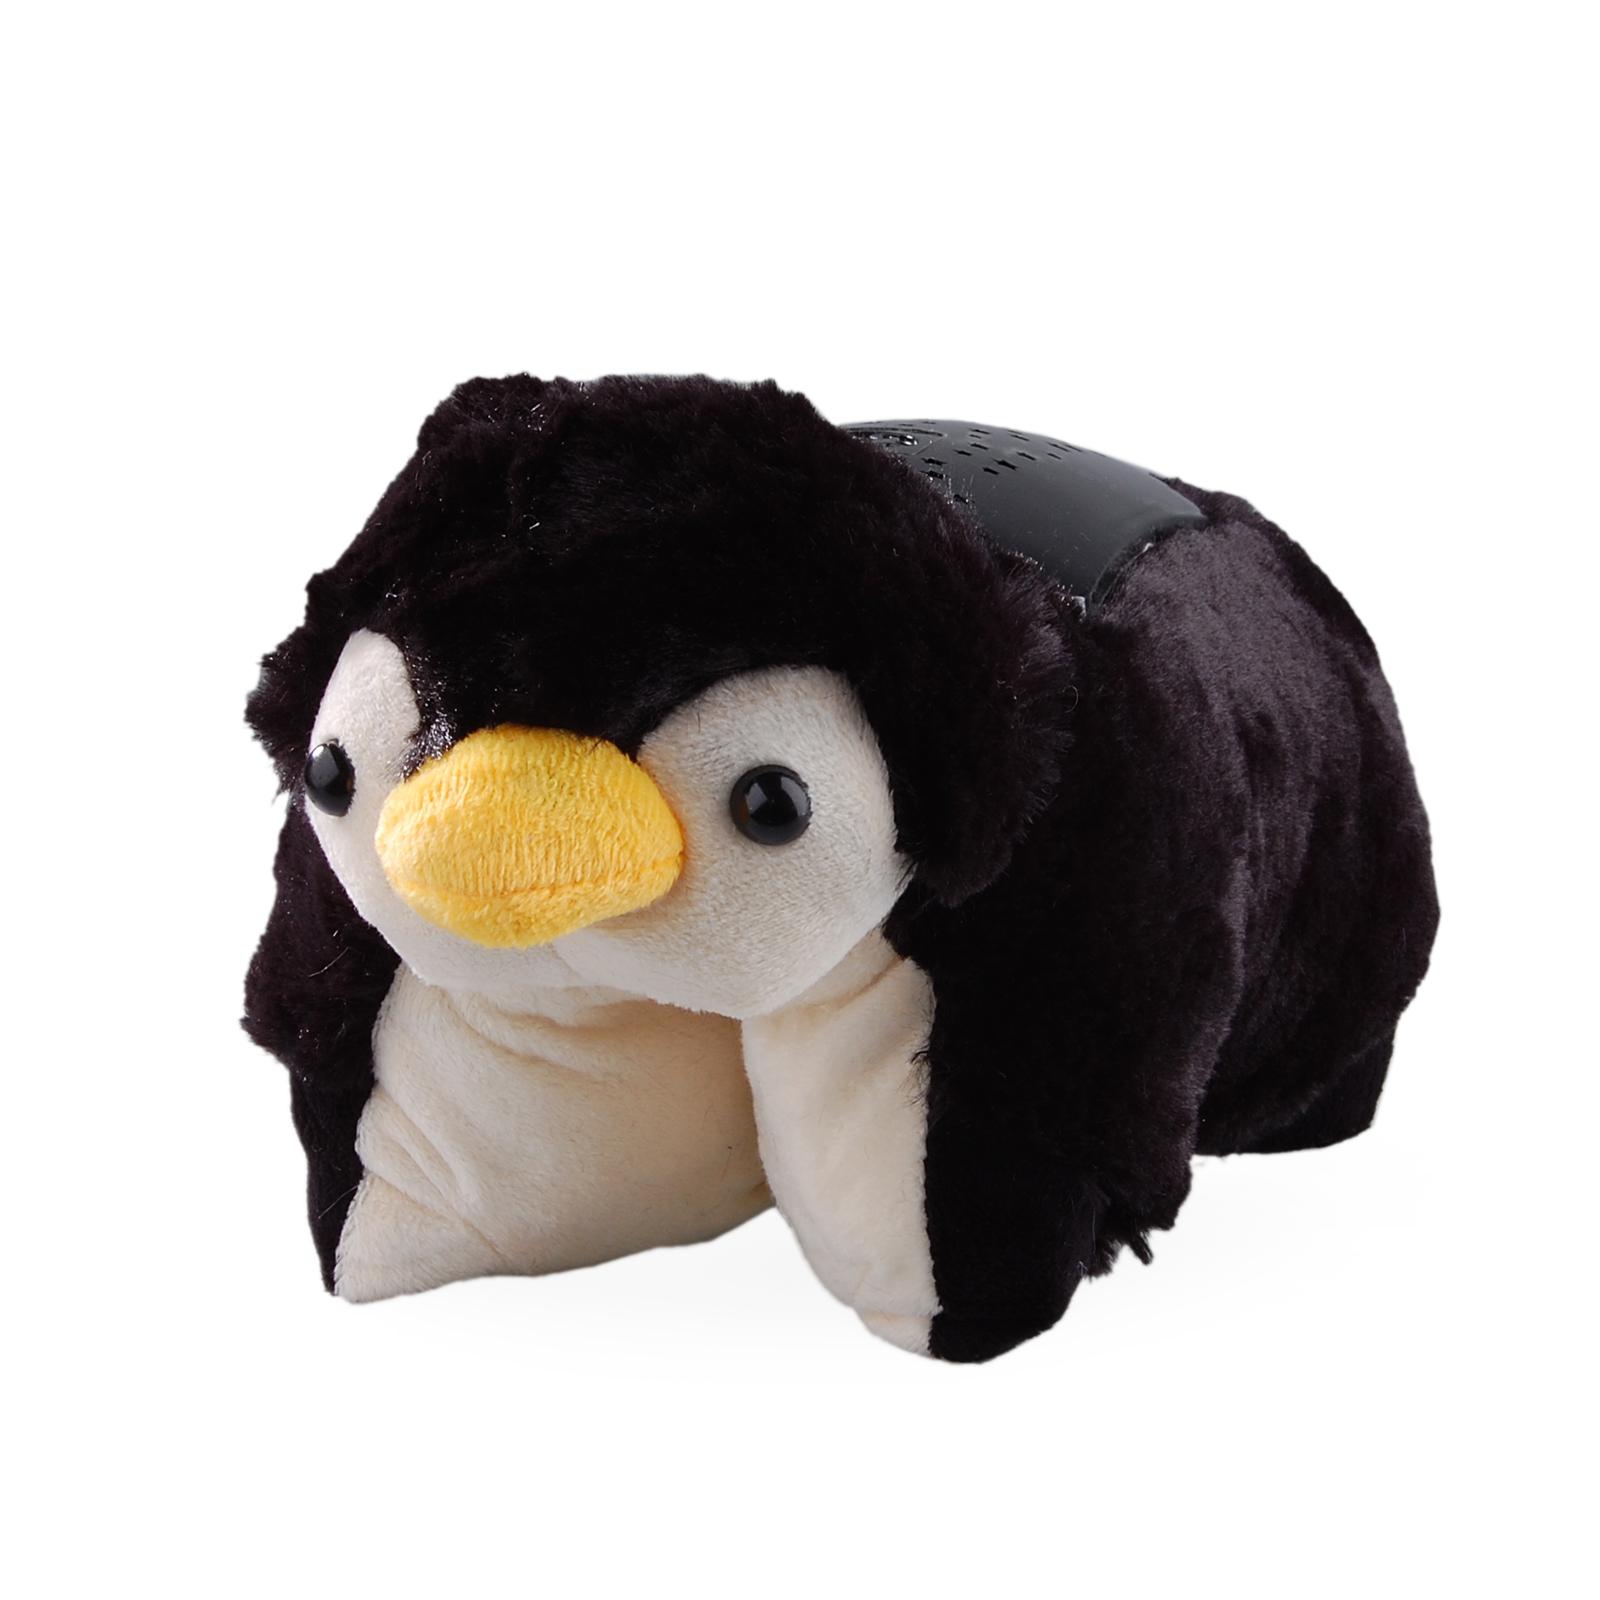 Pillow Pets Dream Lites Playful Penguin 11`Pillow Pet Nightlight Baby Sleeping eBay